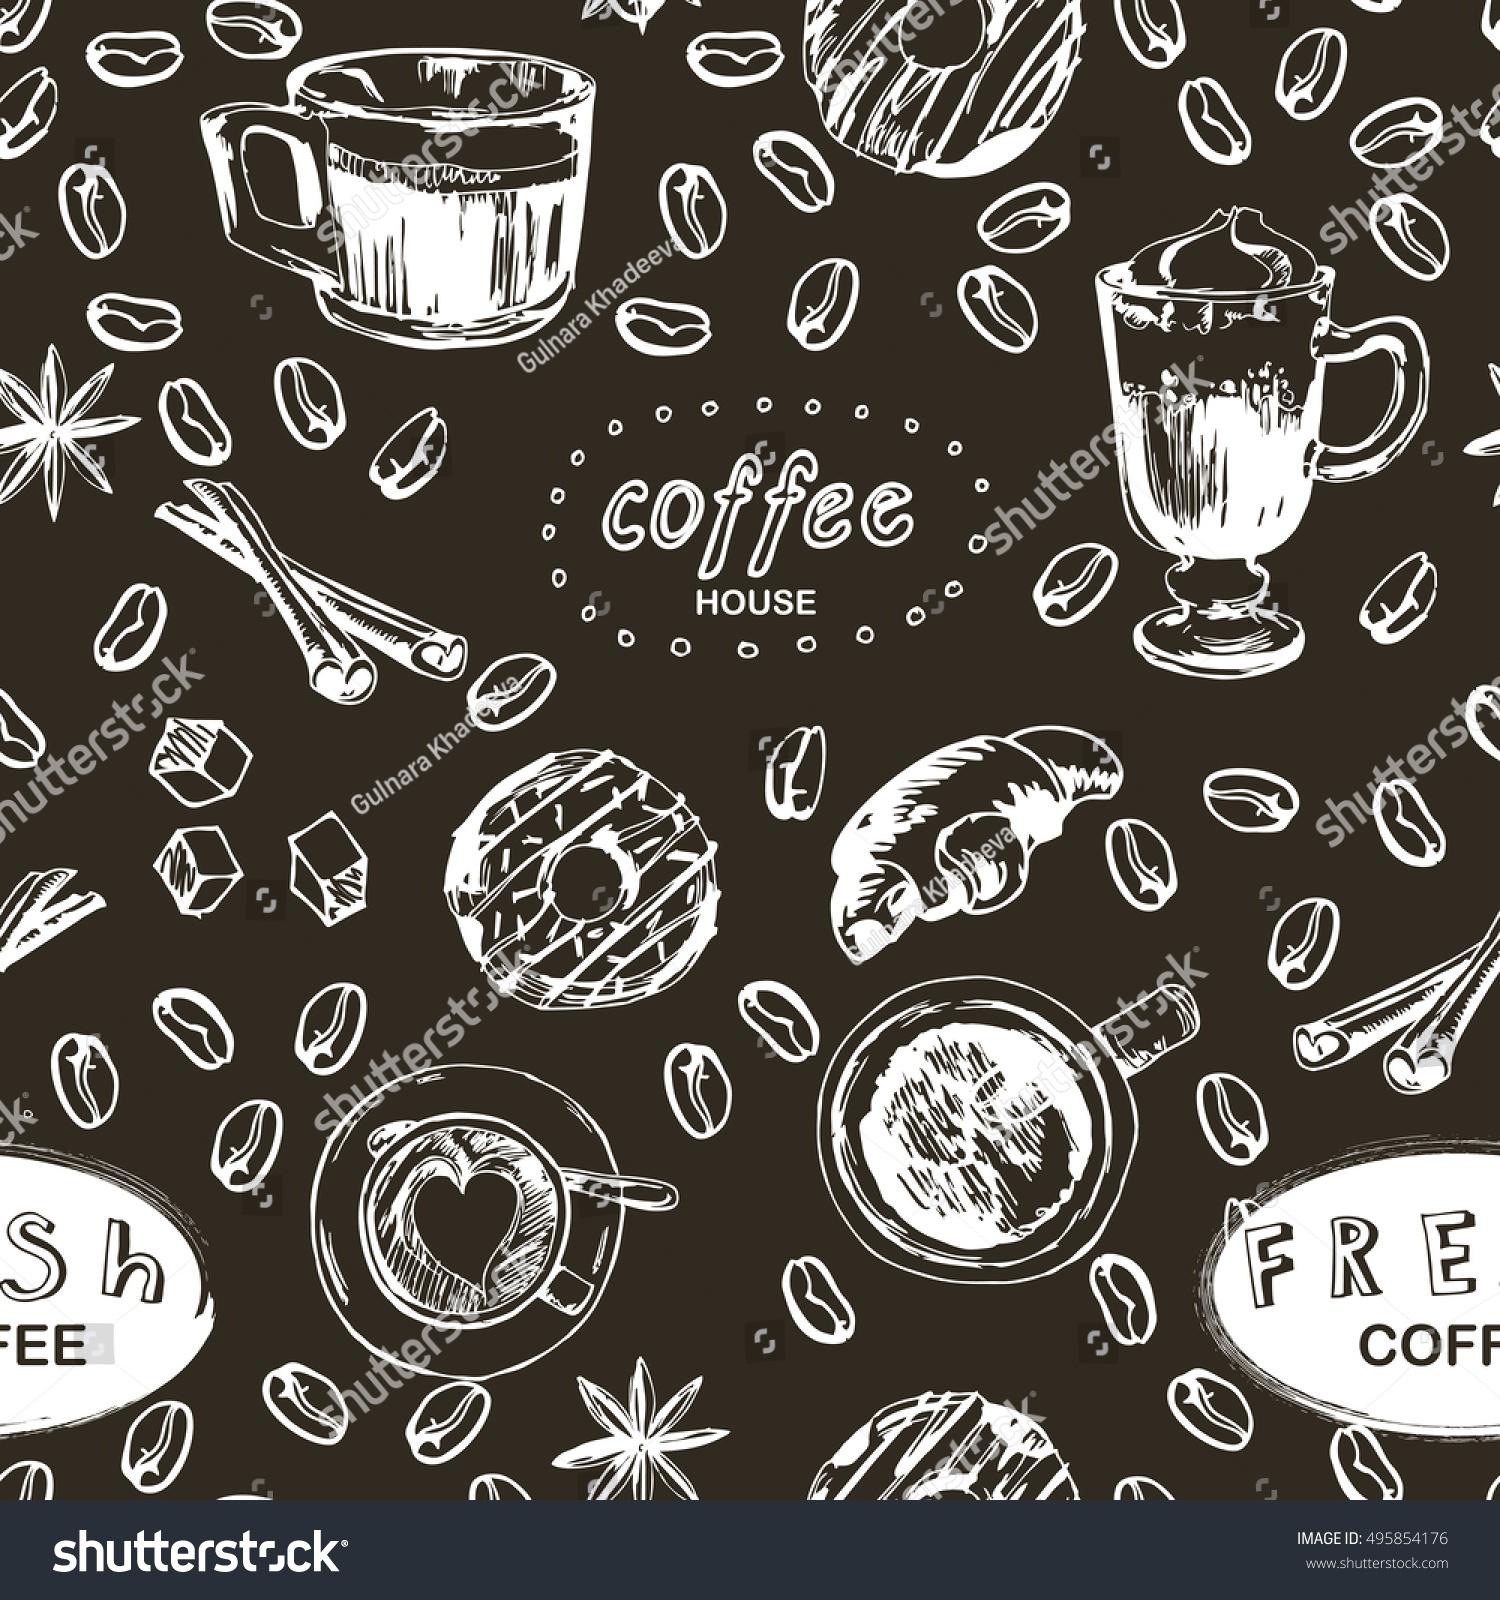 seamless doodle coffee pattern -#main